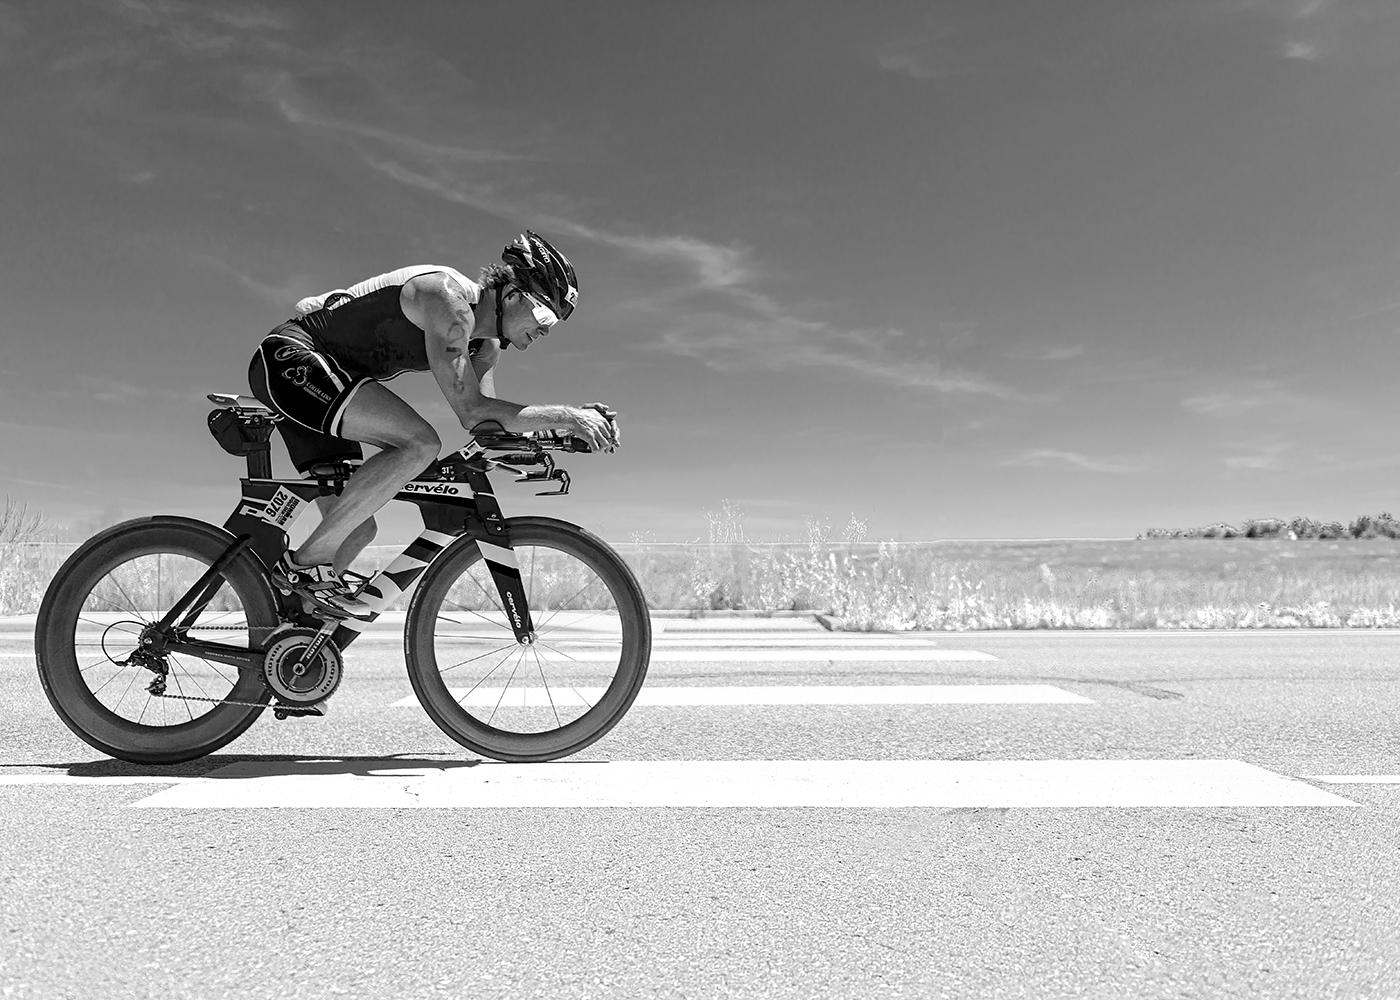 Racer # 2076 at mile 101.5 of 112 on the bike course.  2014 Ironman Boulder. Boulder, CO